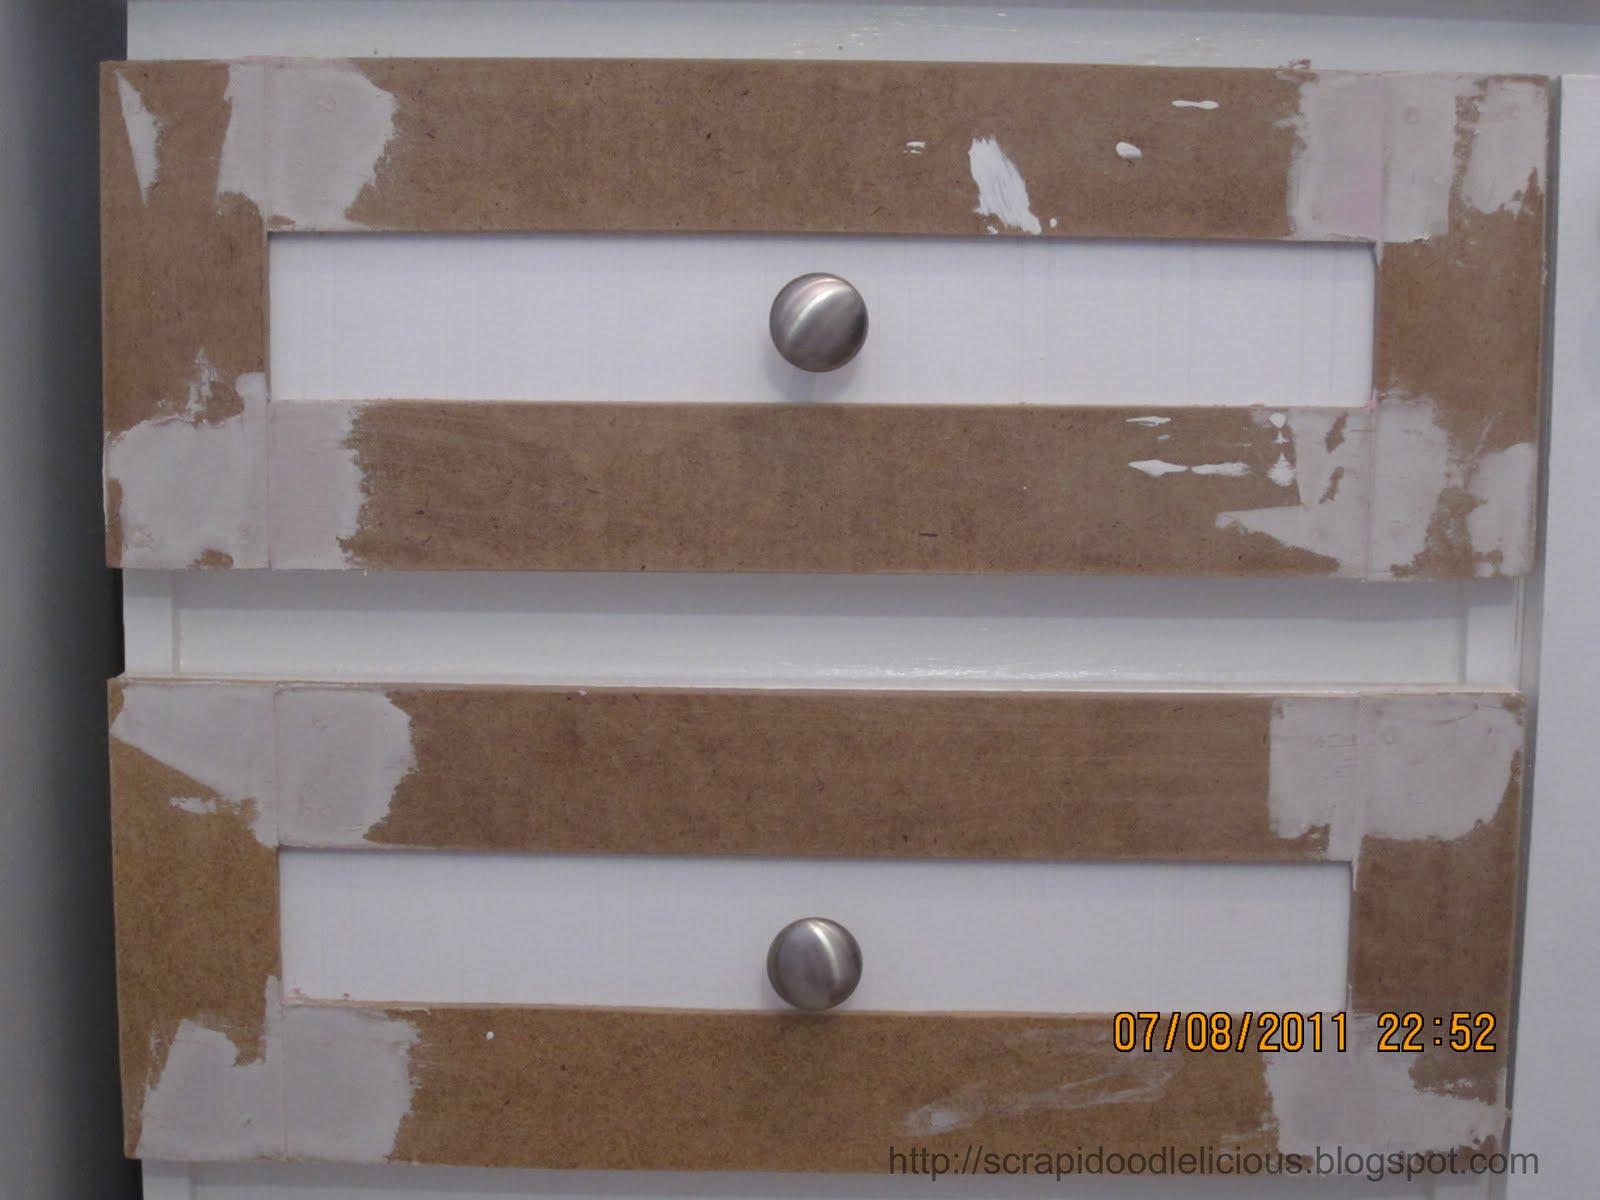 Scrapidoodlelicious Beadboard Wallpaper in Kitchen Cabinets 1600x1200